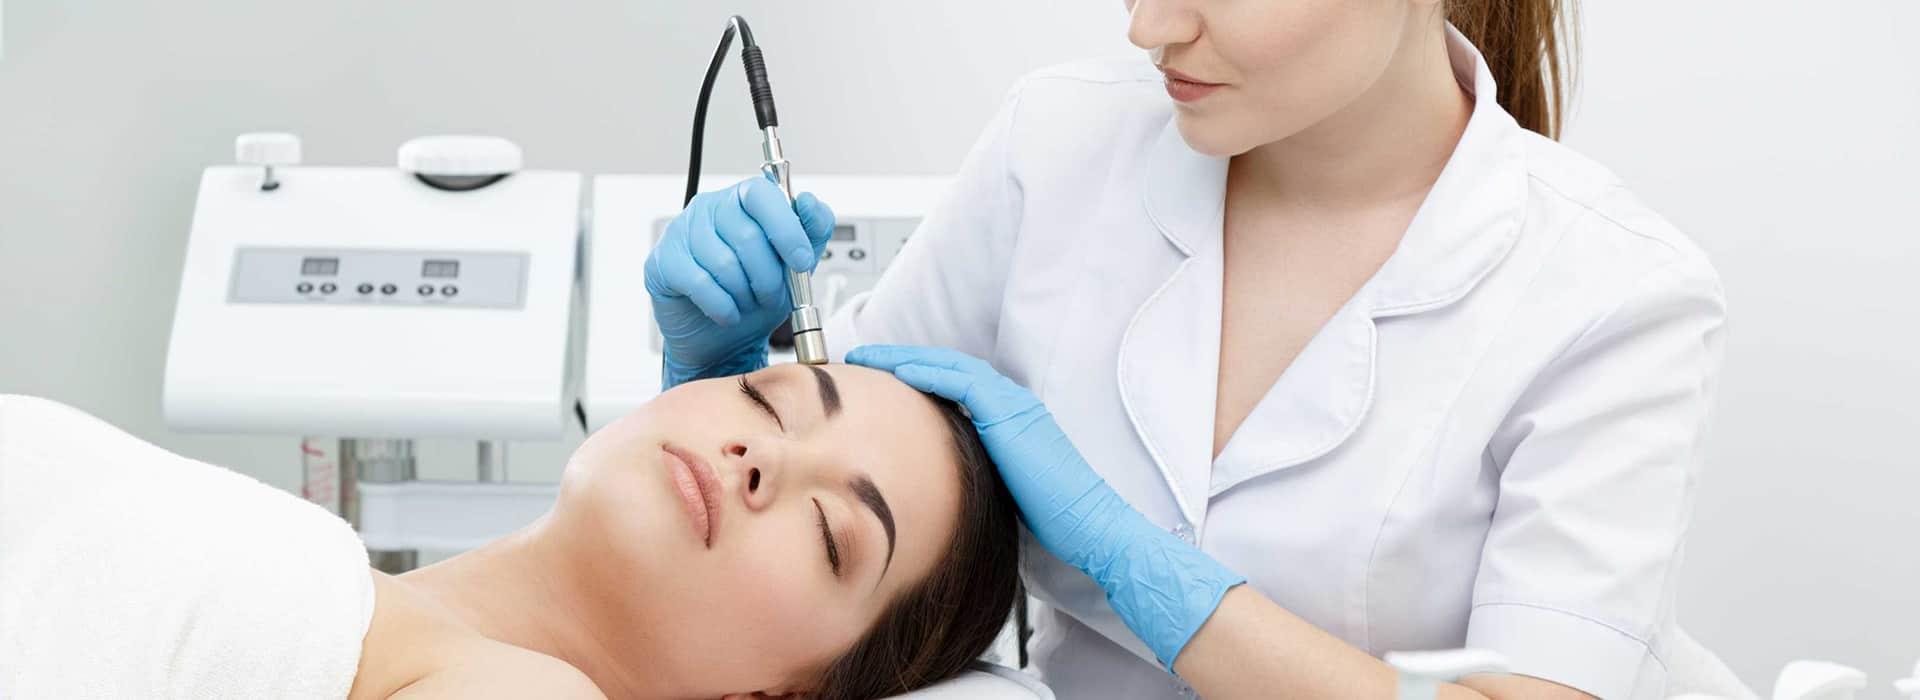 services-dermatology